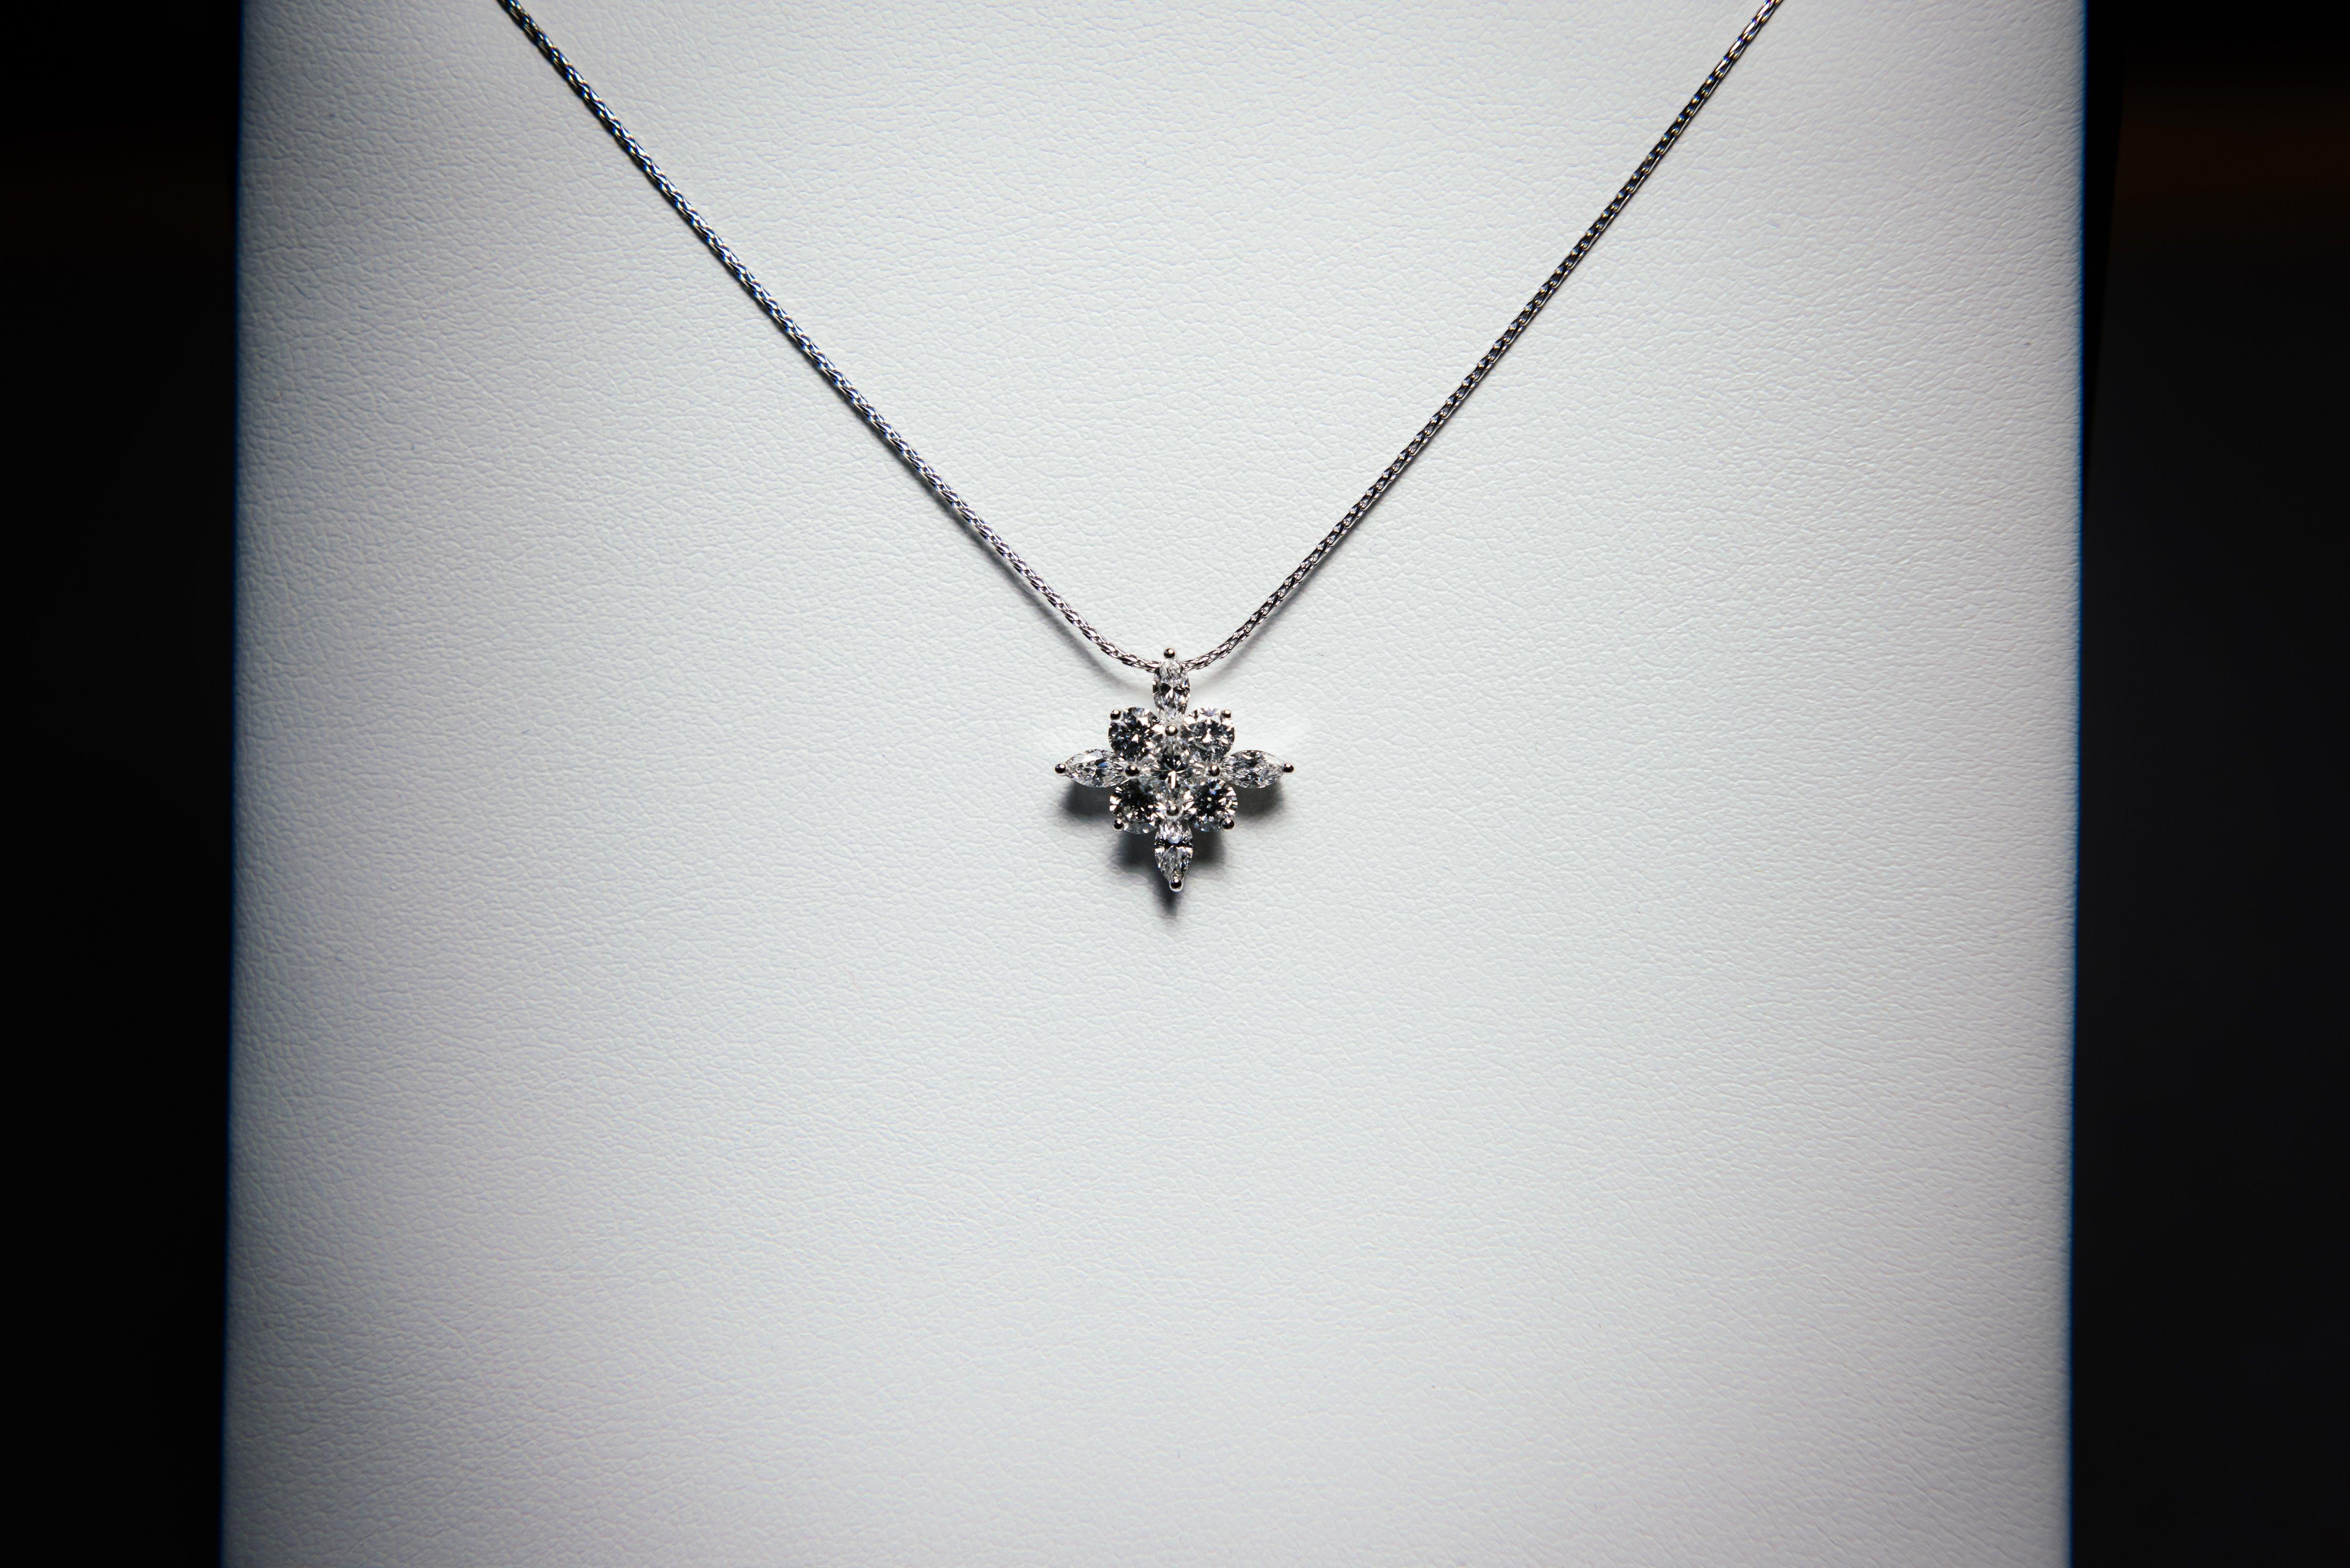 A stunning pendant